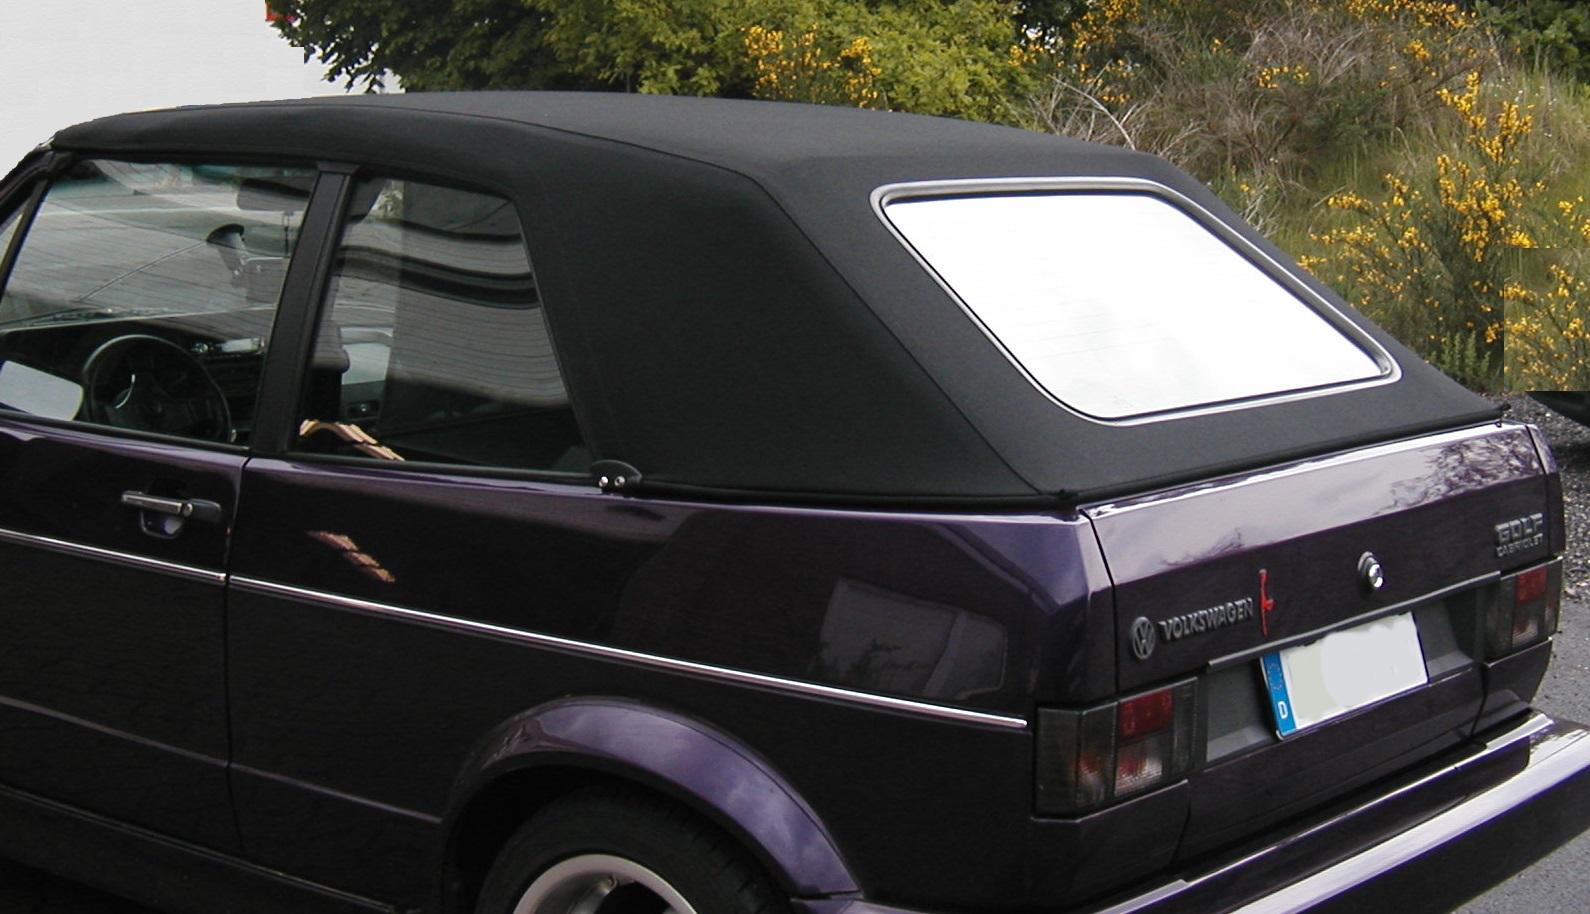 vw golf 1 cabrio verdeck cabrioverdeck stoff schwarz neu. Black Bedroom Furniture Sets. Home Design Ideas